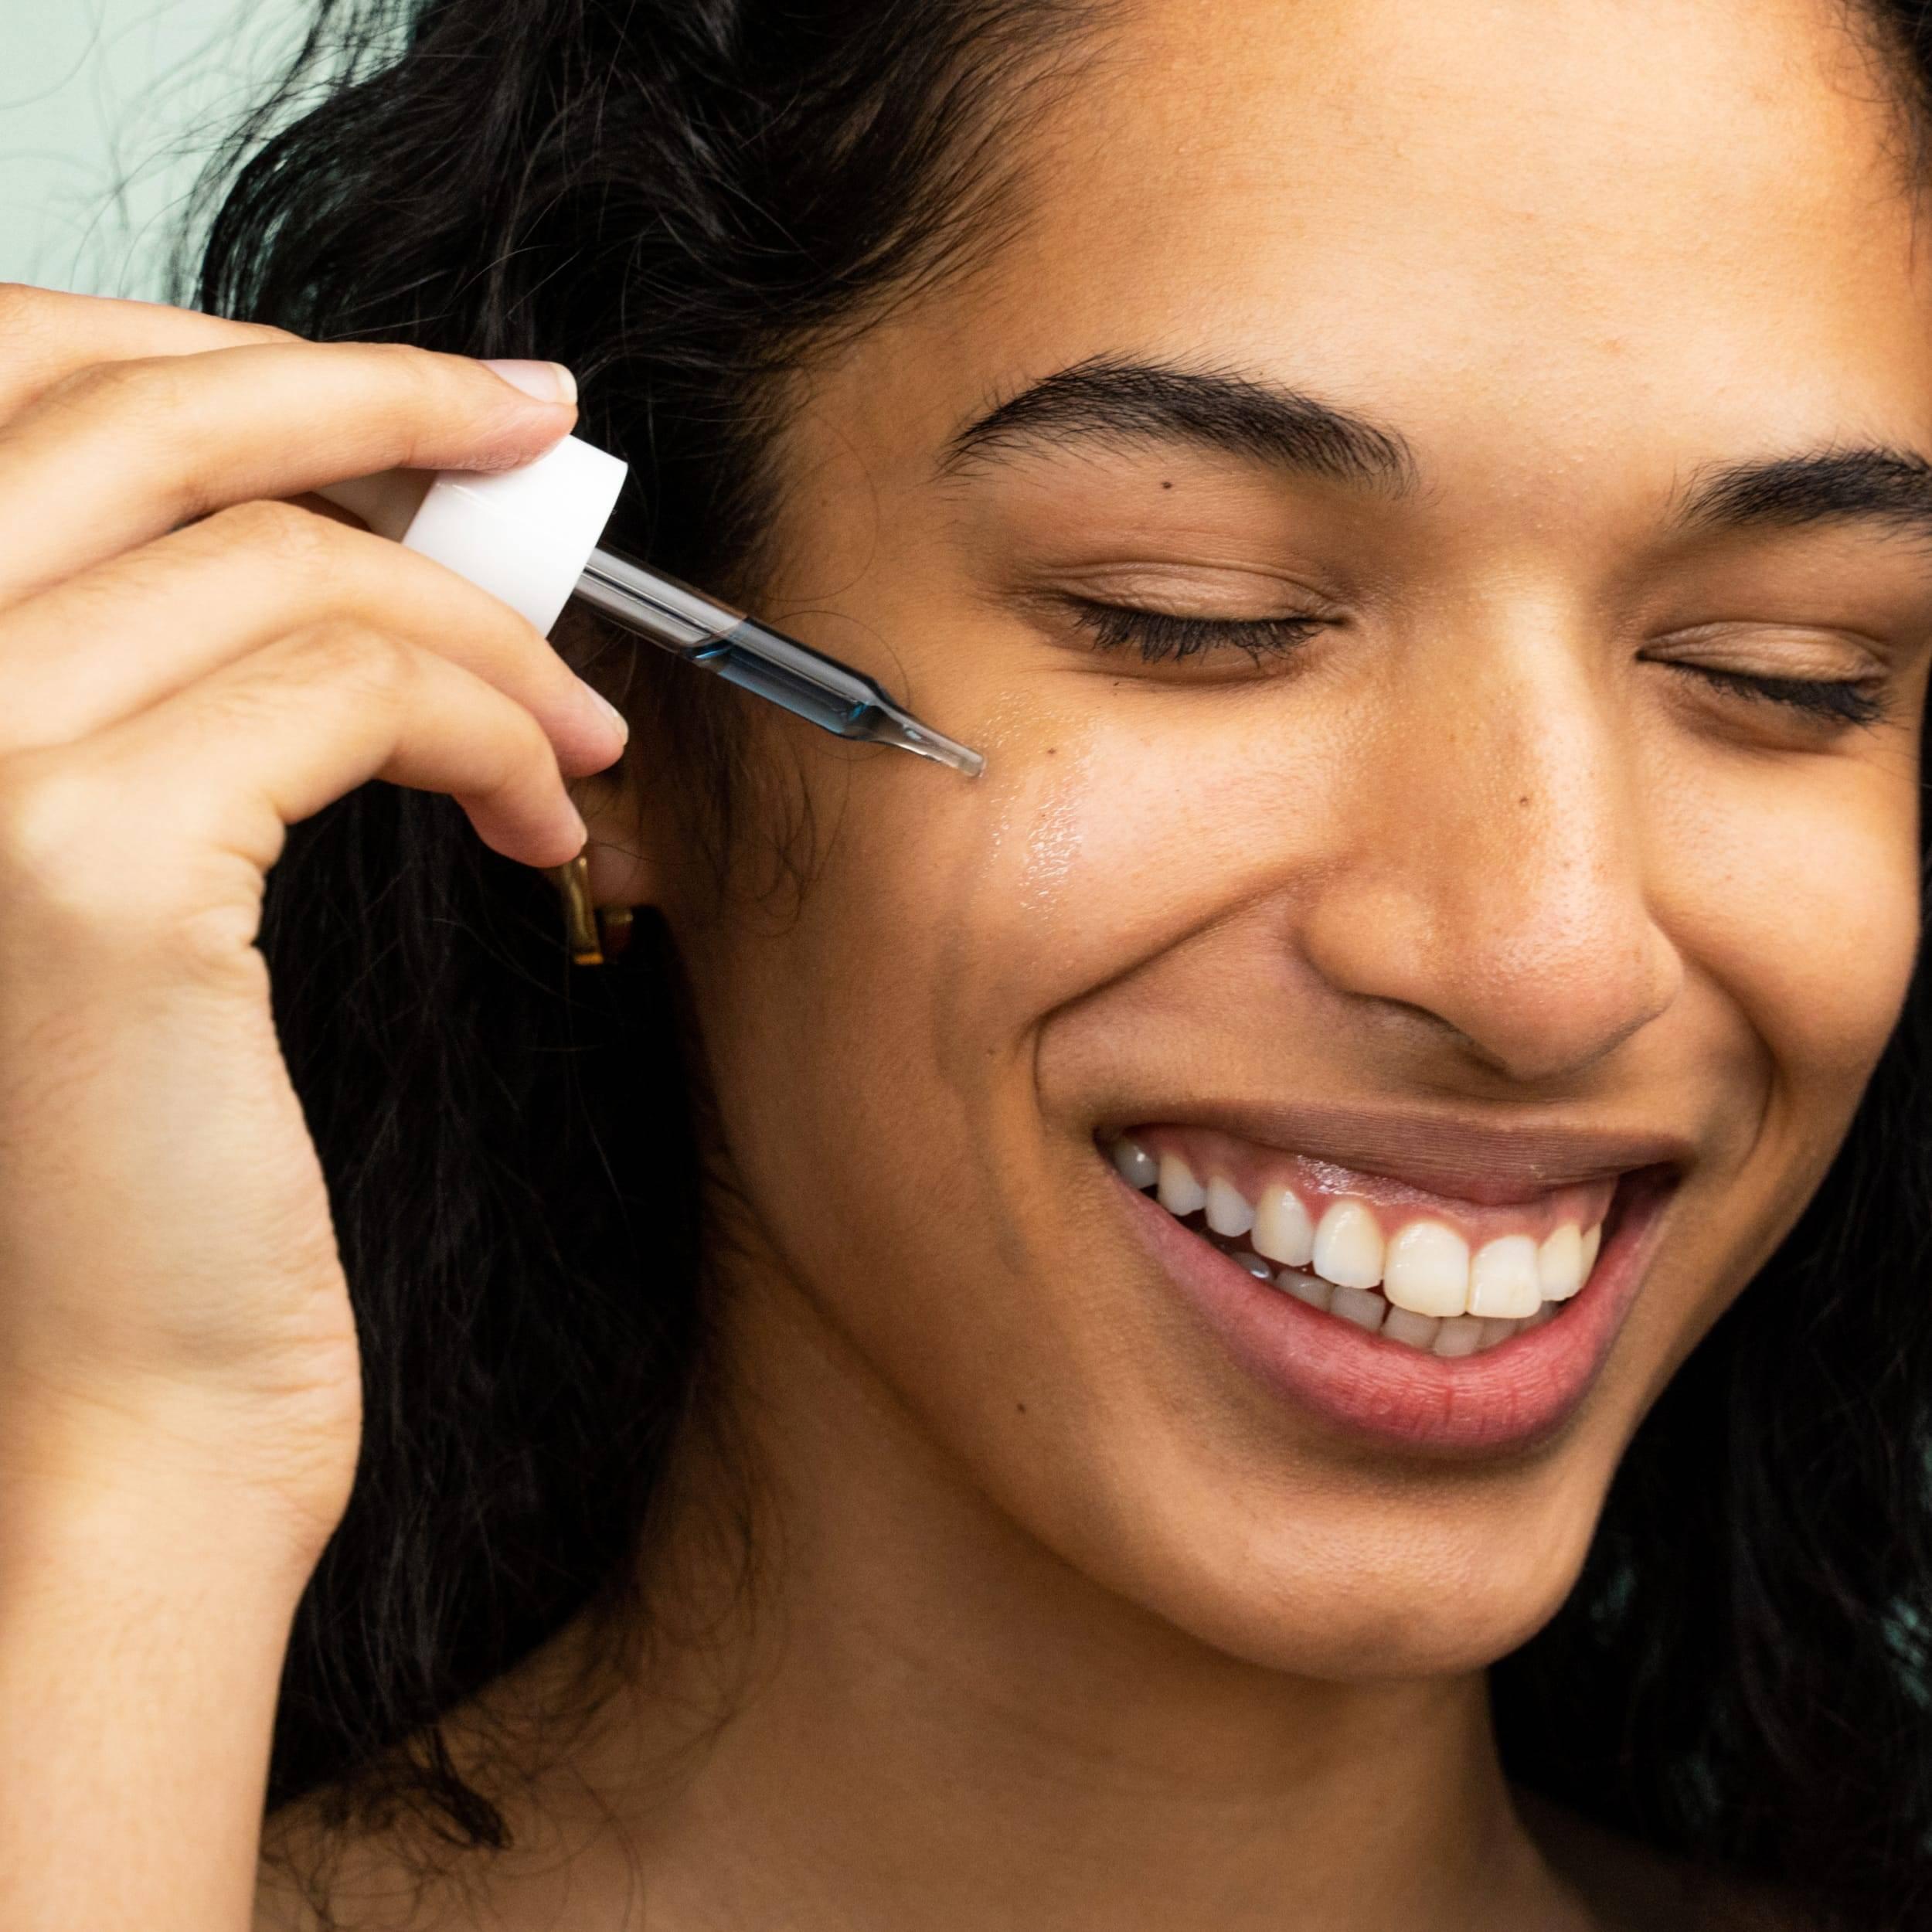 Model using Blue Tansy Facial Oil